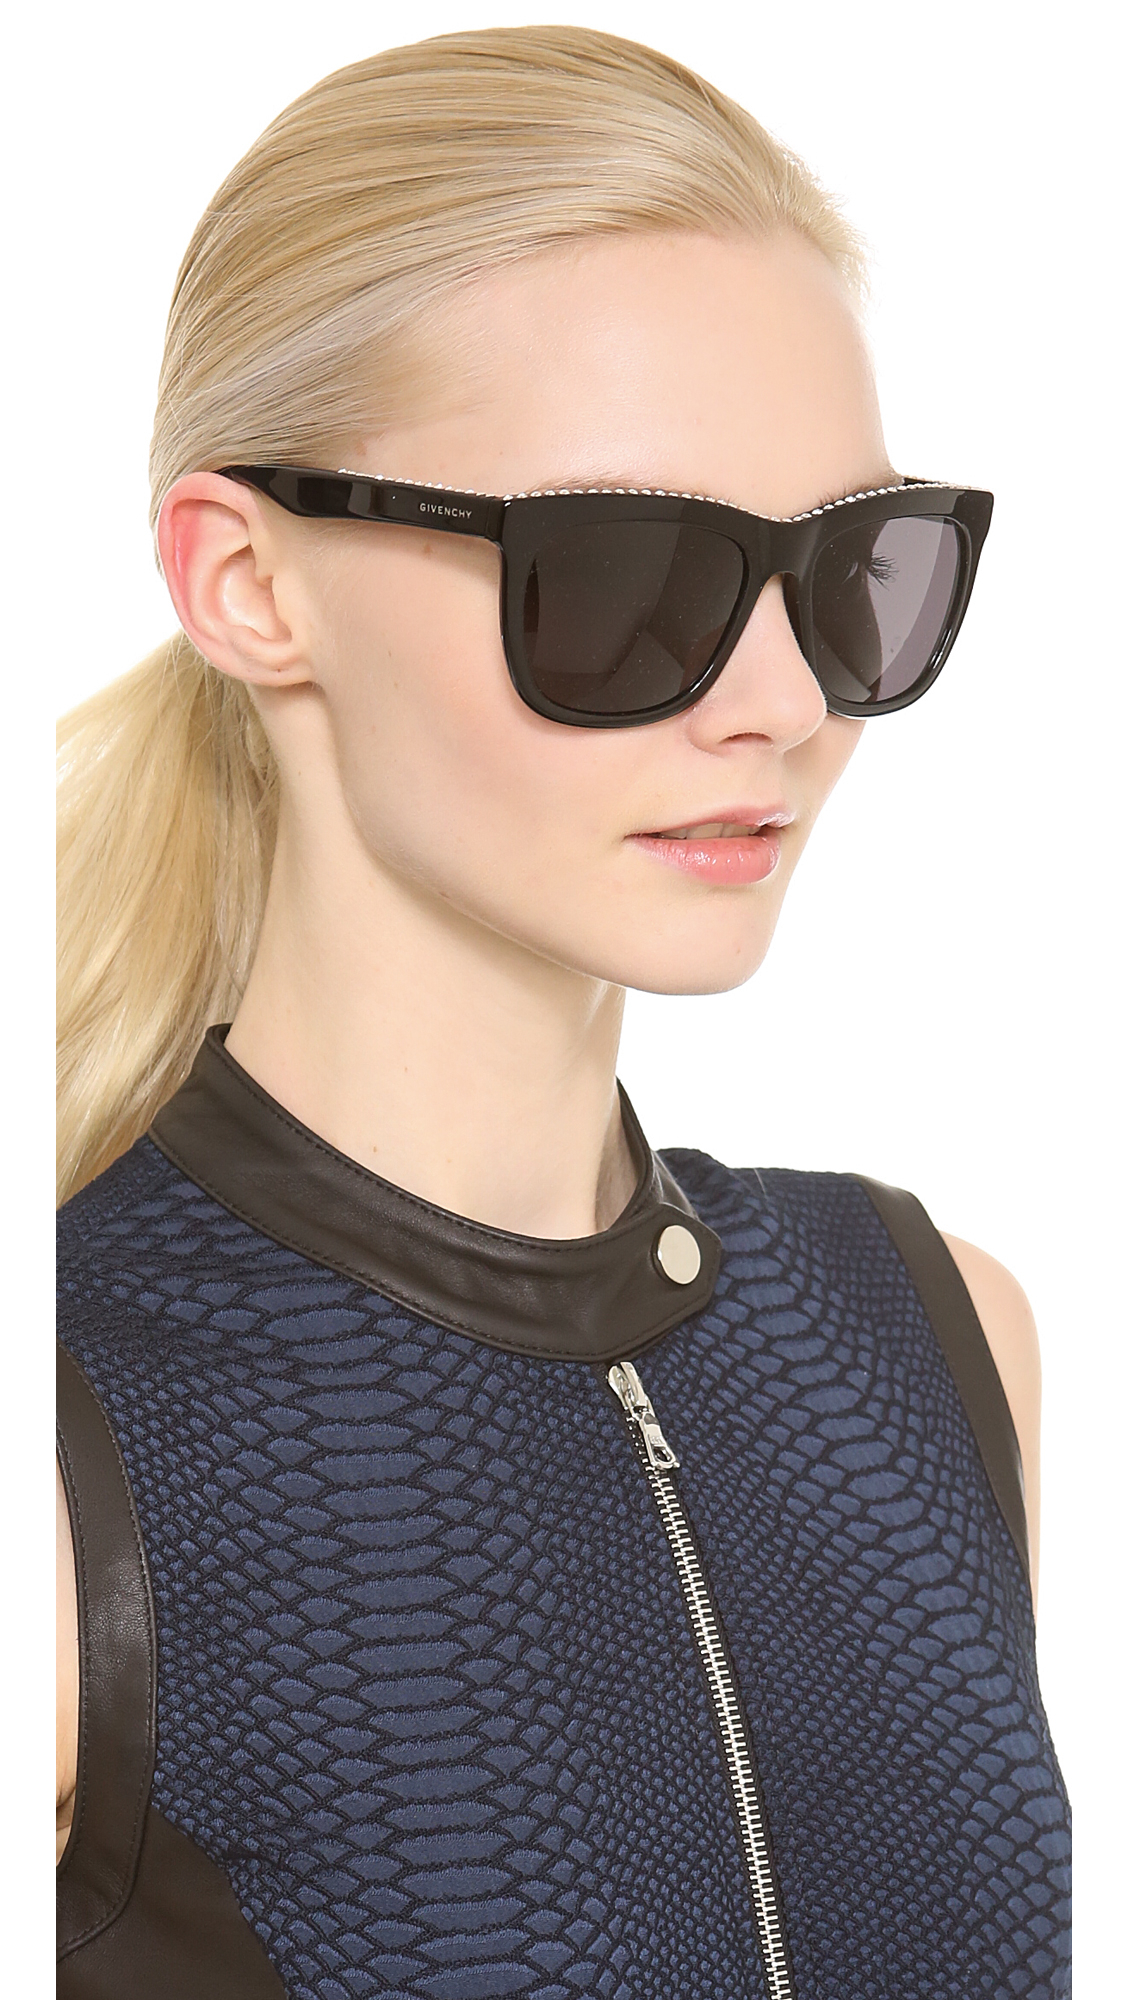 1a2ac6f2c5 Givenchy Swarovski Crystal Rim Sunglasses Blacksmoke in Black - Lyst